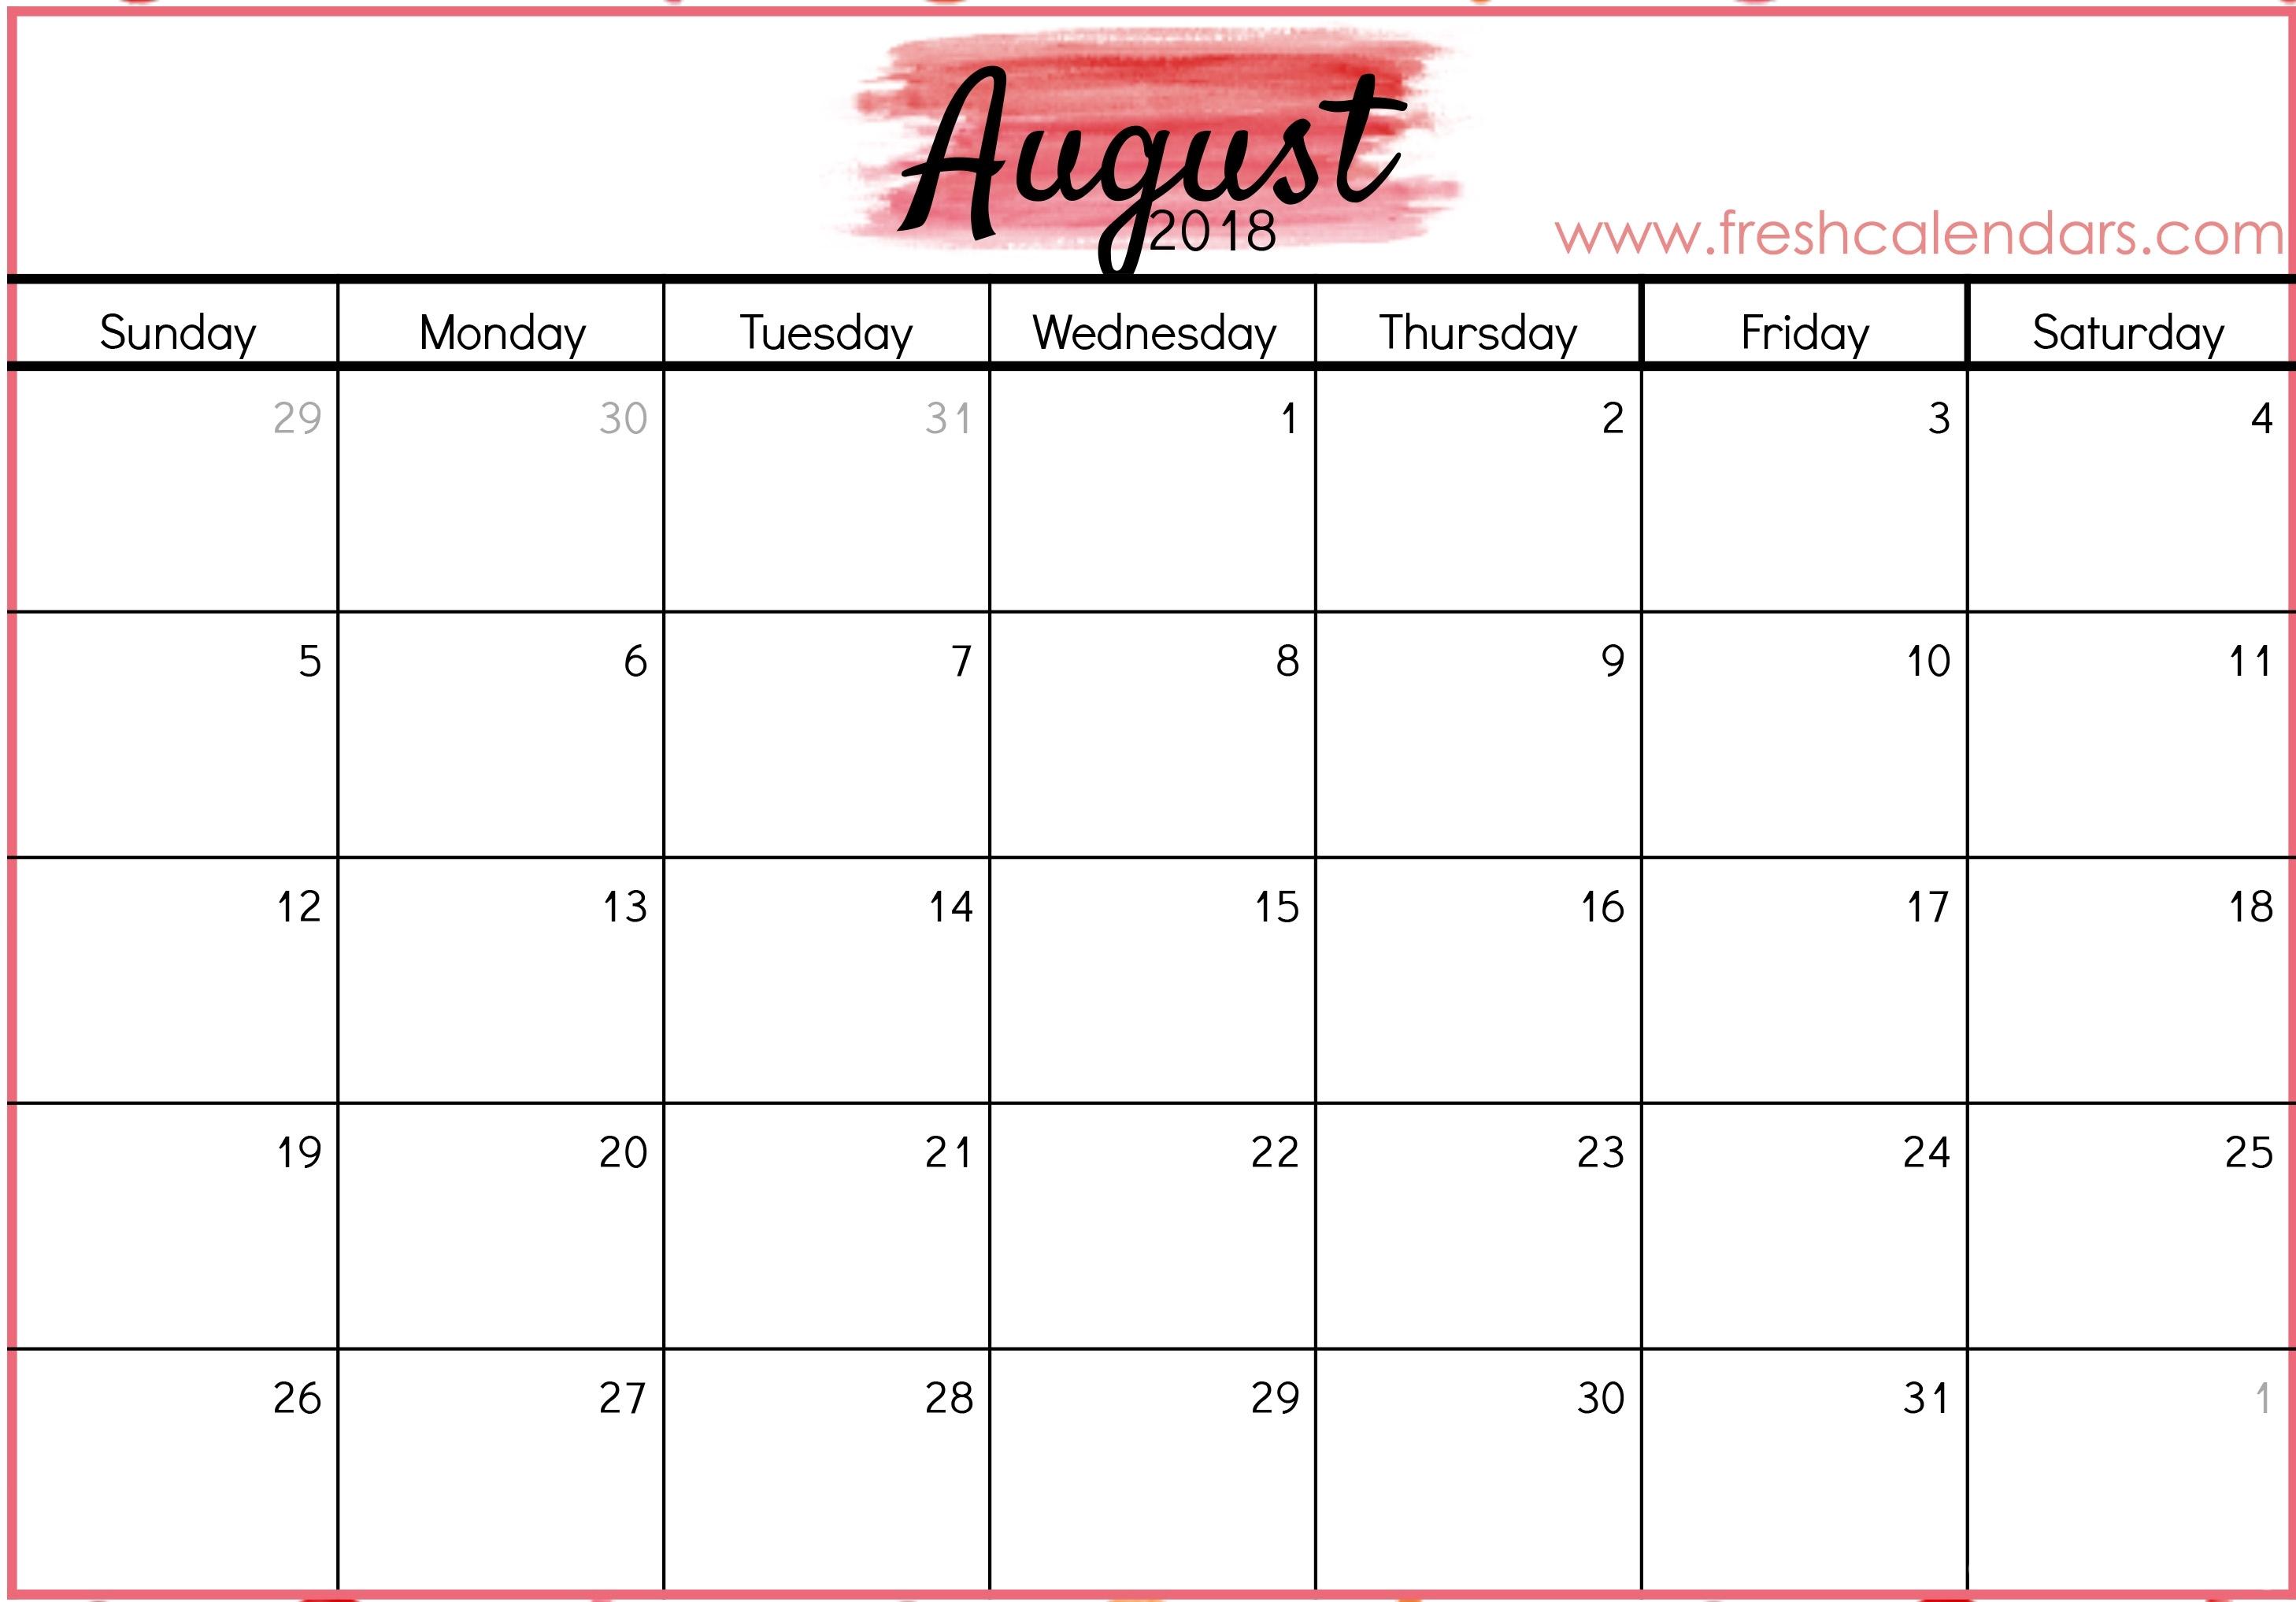 August 2018 Calendar Printable - Fresh Calendars with regard to August Printable Calendar By Month